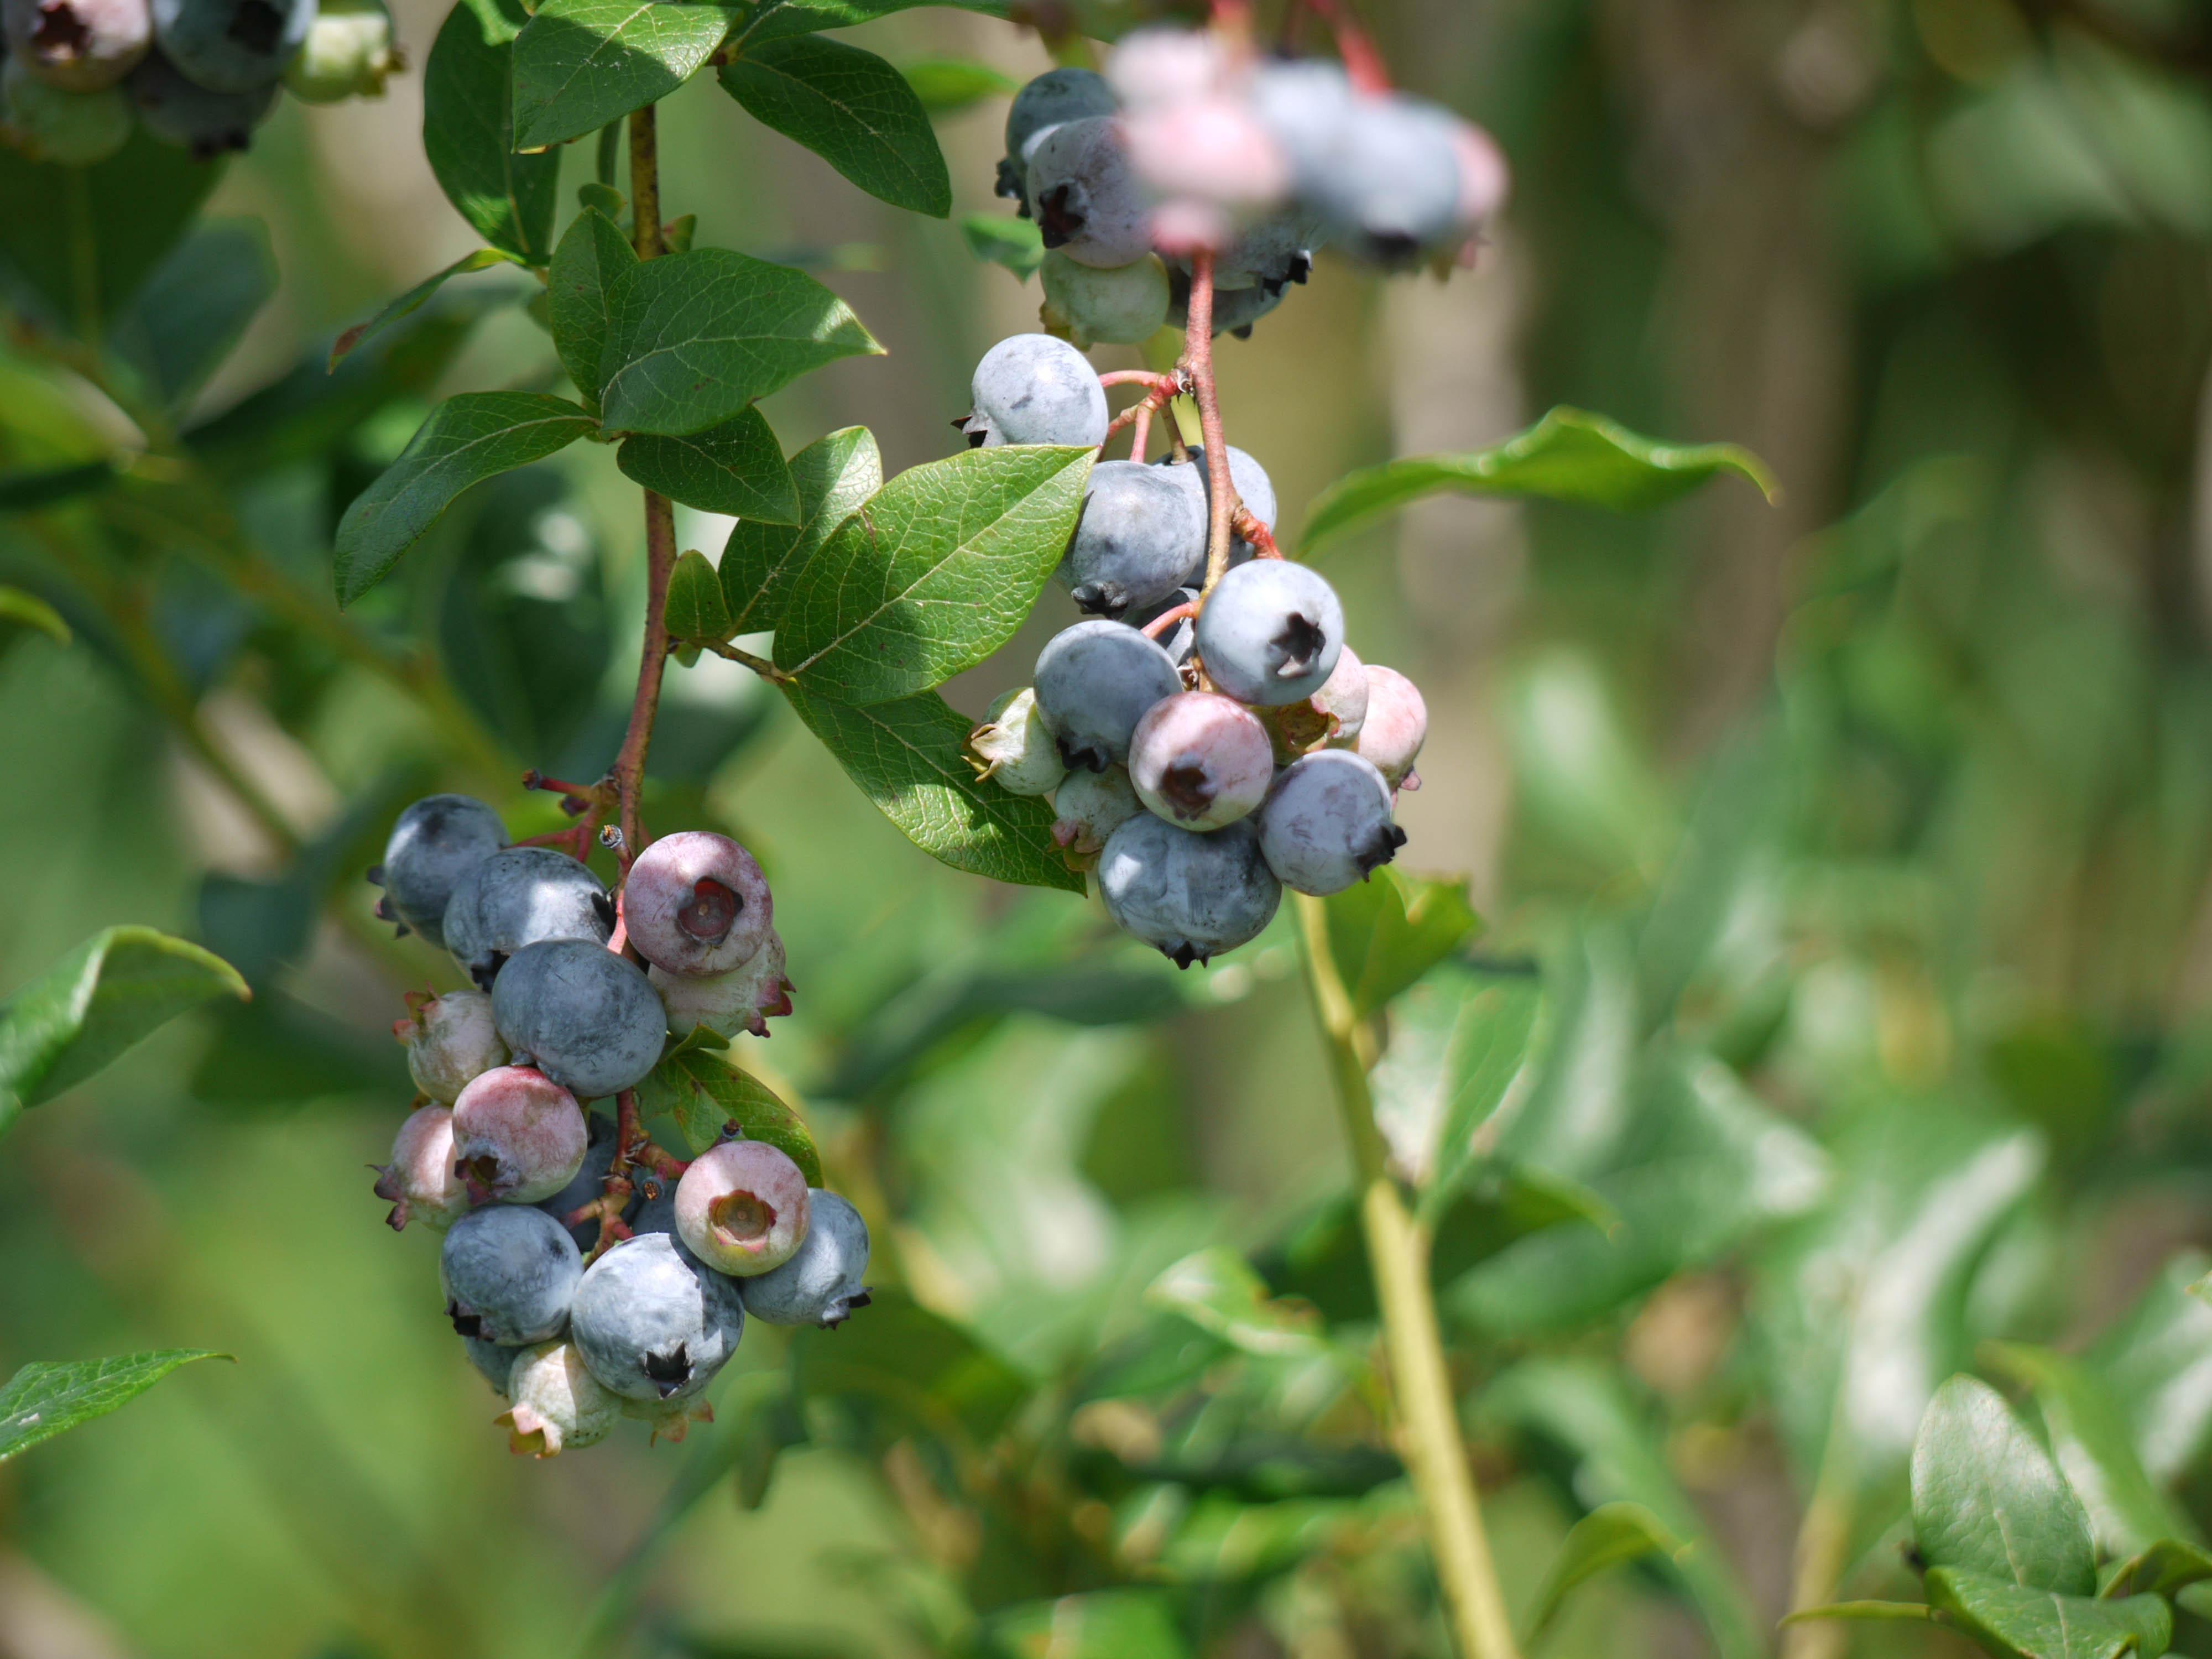 Paupack Blueberry Farm